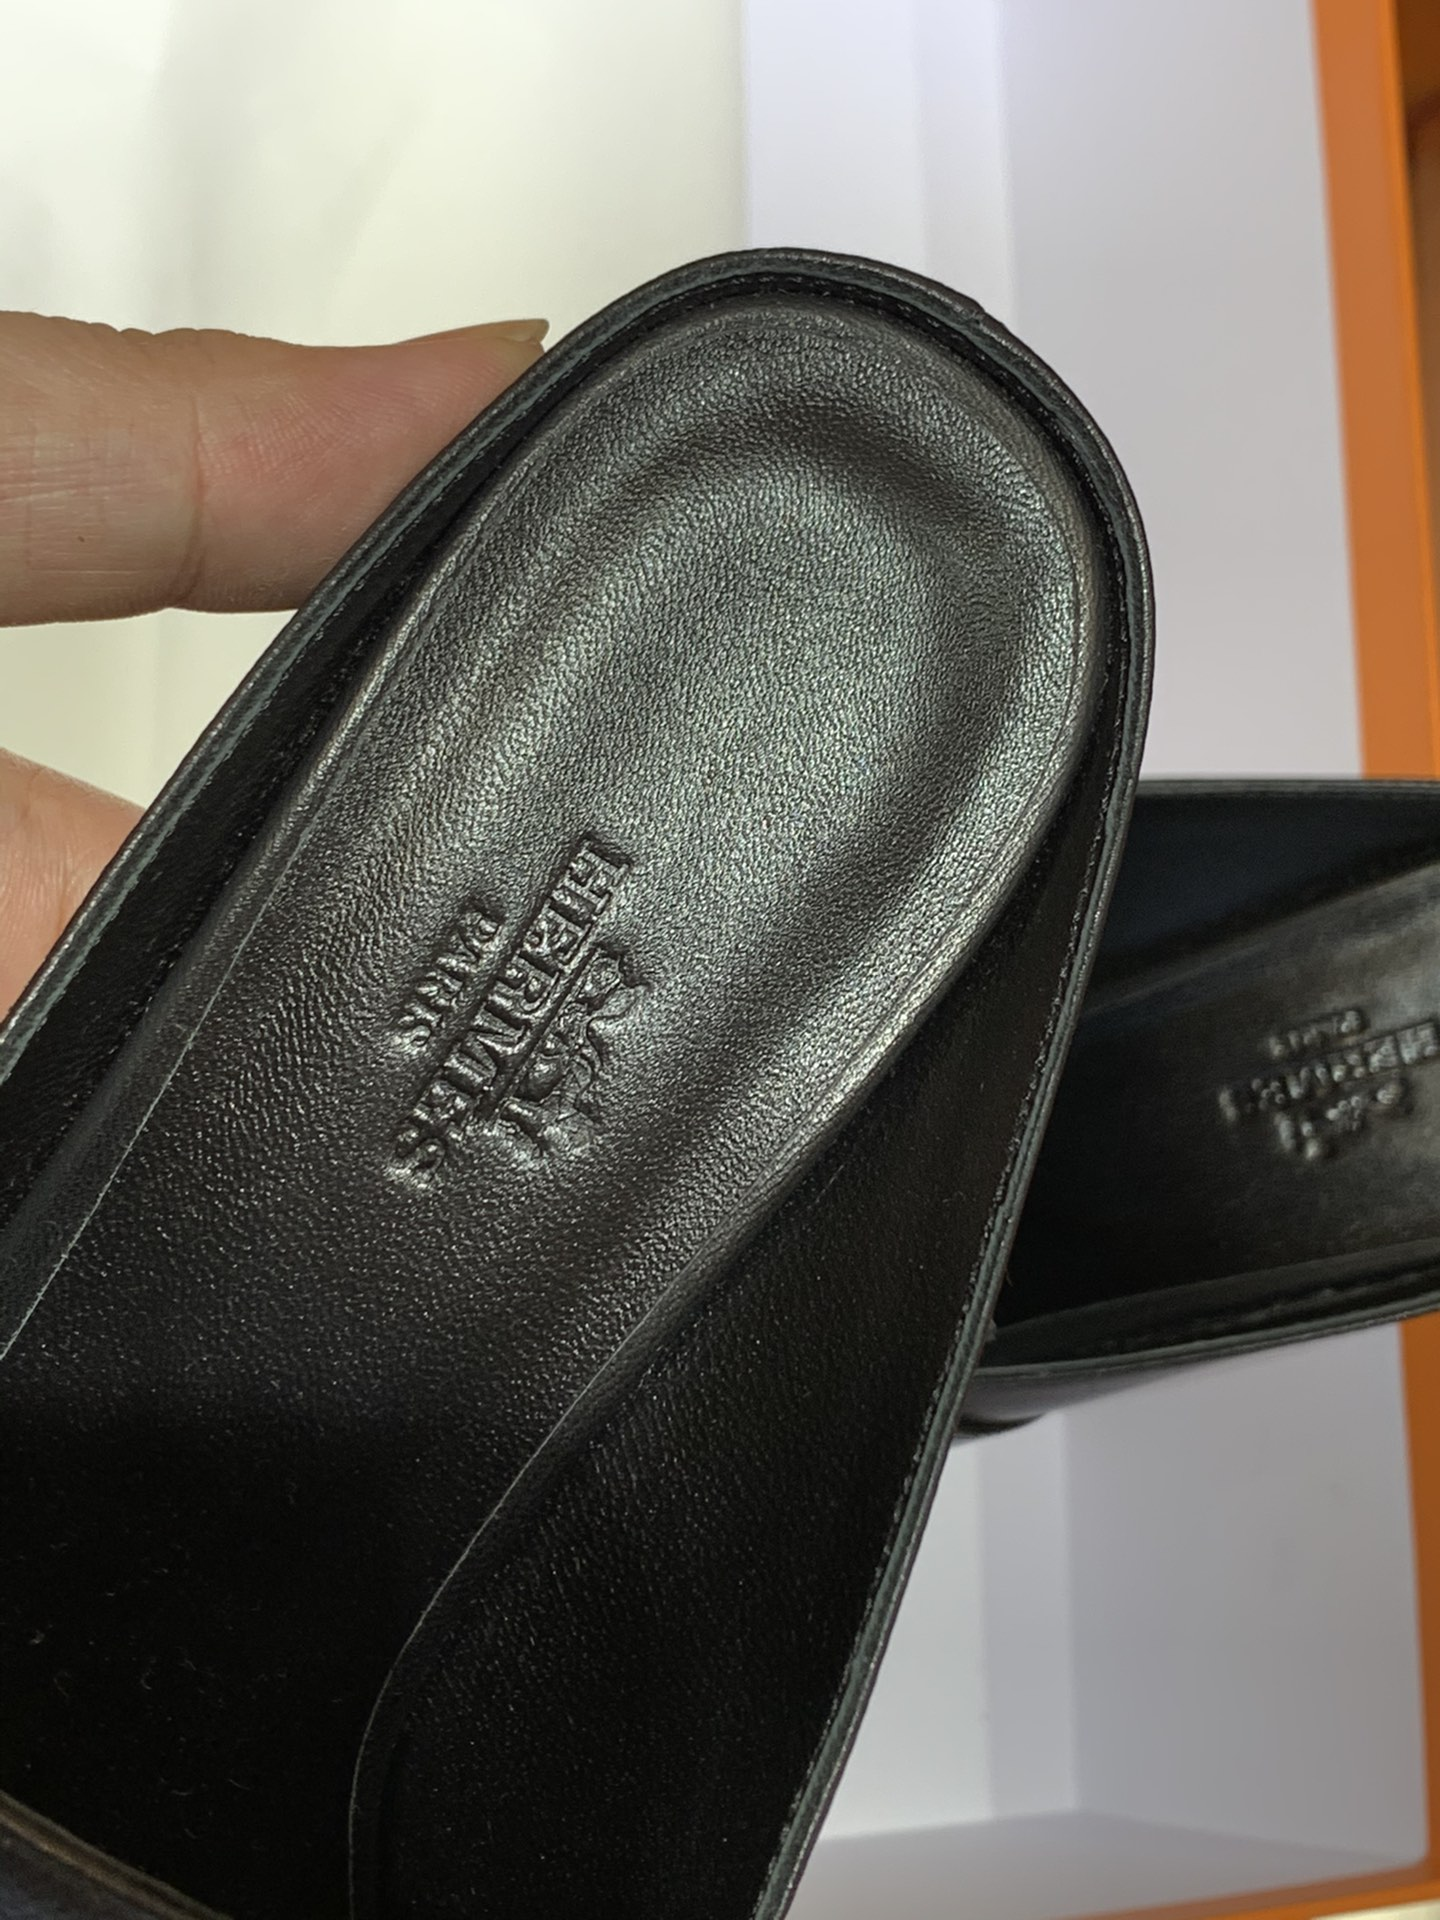 Hermes爱马仕 秋冬新款专柜同步上新  山羊皮  黑色 Blossom 穆勒鞋  搭配经典kelly鞋扣 打造悠闲典雅风范 山羊皮  跟高6cm  35~41码 (正码)码数不调换